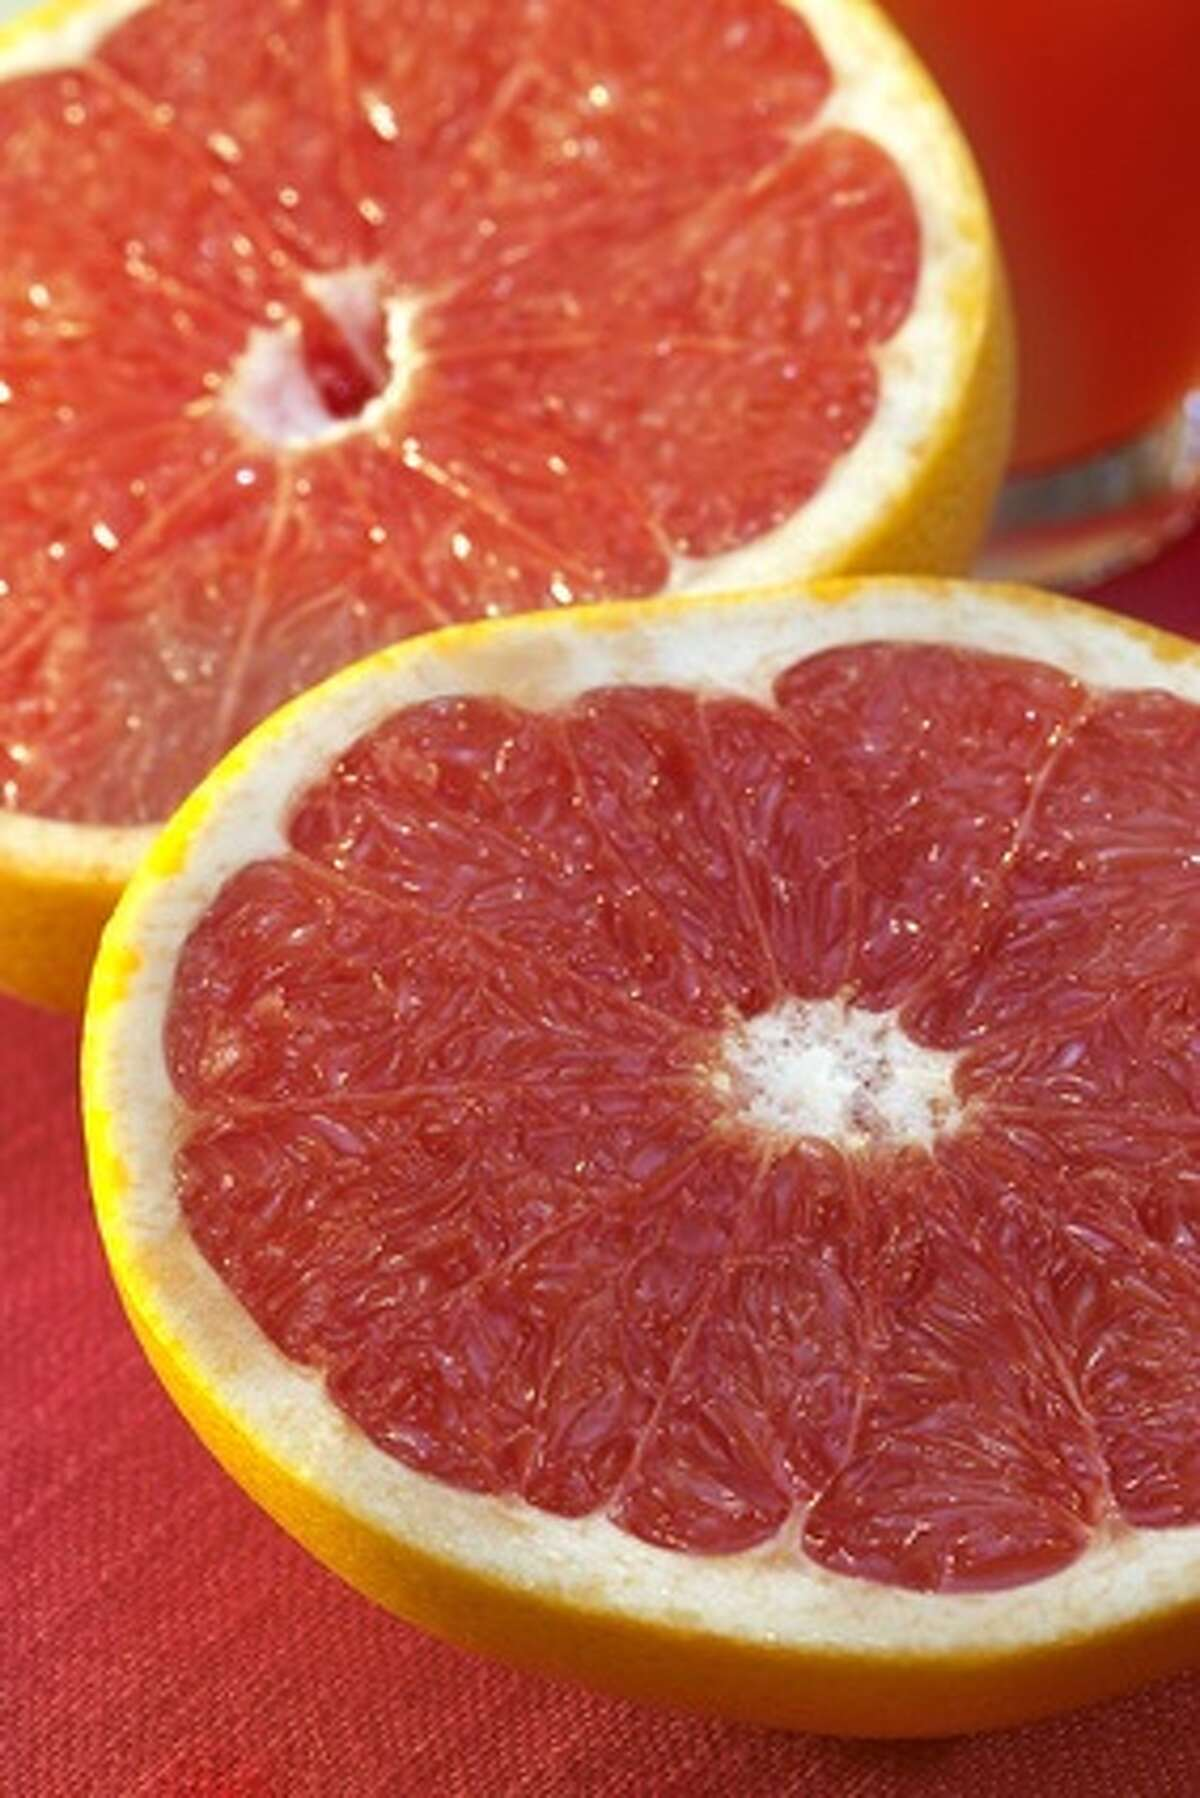 THENFresh GrapefruitConsumption change: -65.9% decrease since 1970Source: HealthGrove